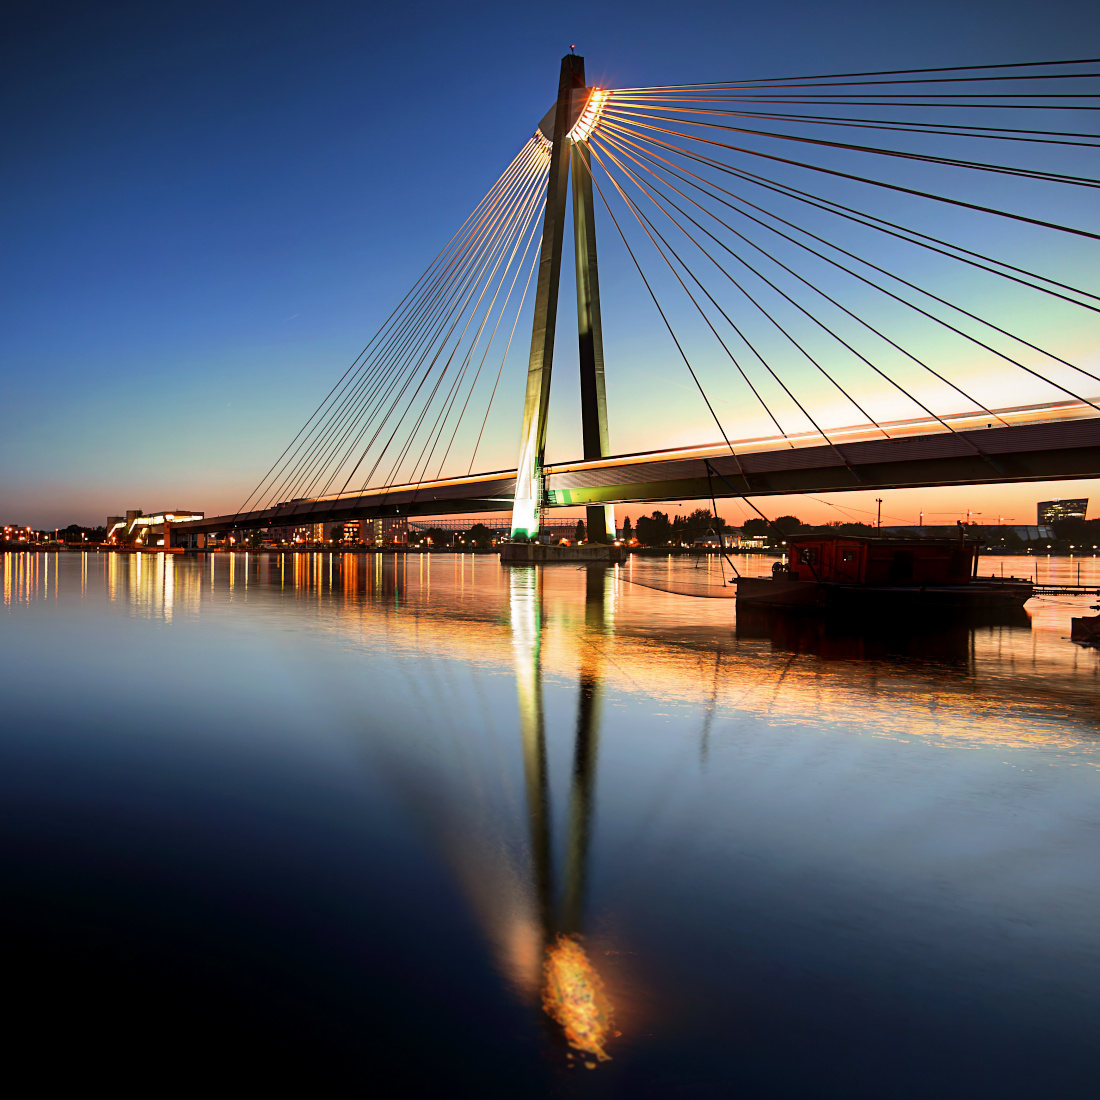 Blue Danube II by focusgallery